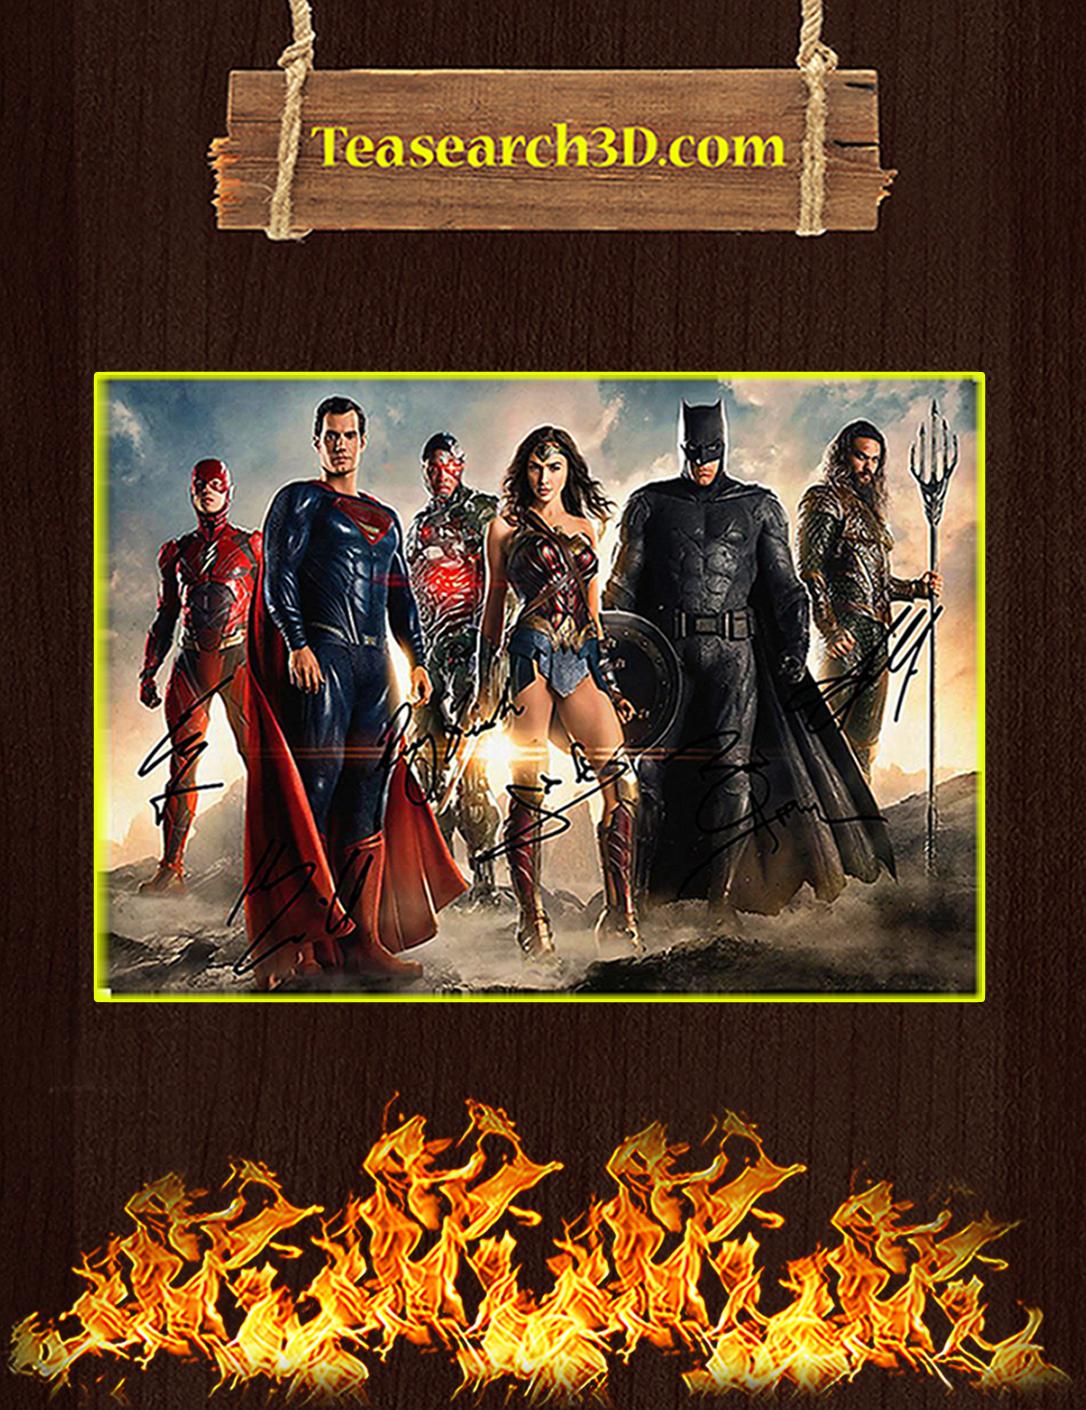 Dc superheroes wonder woman superman batman signature poster A2